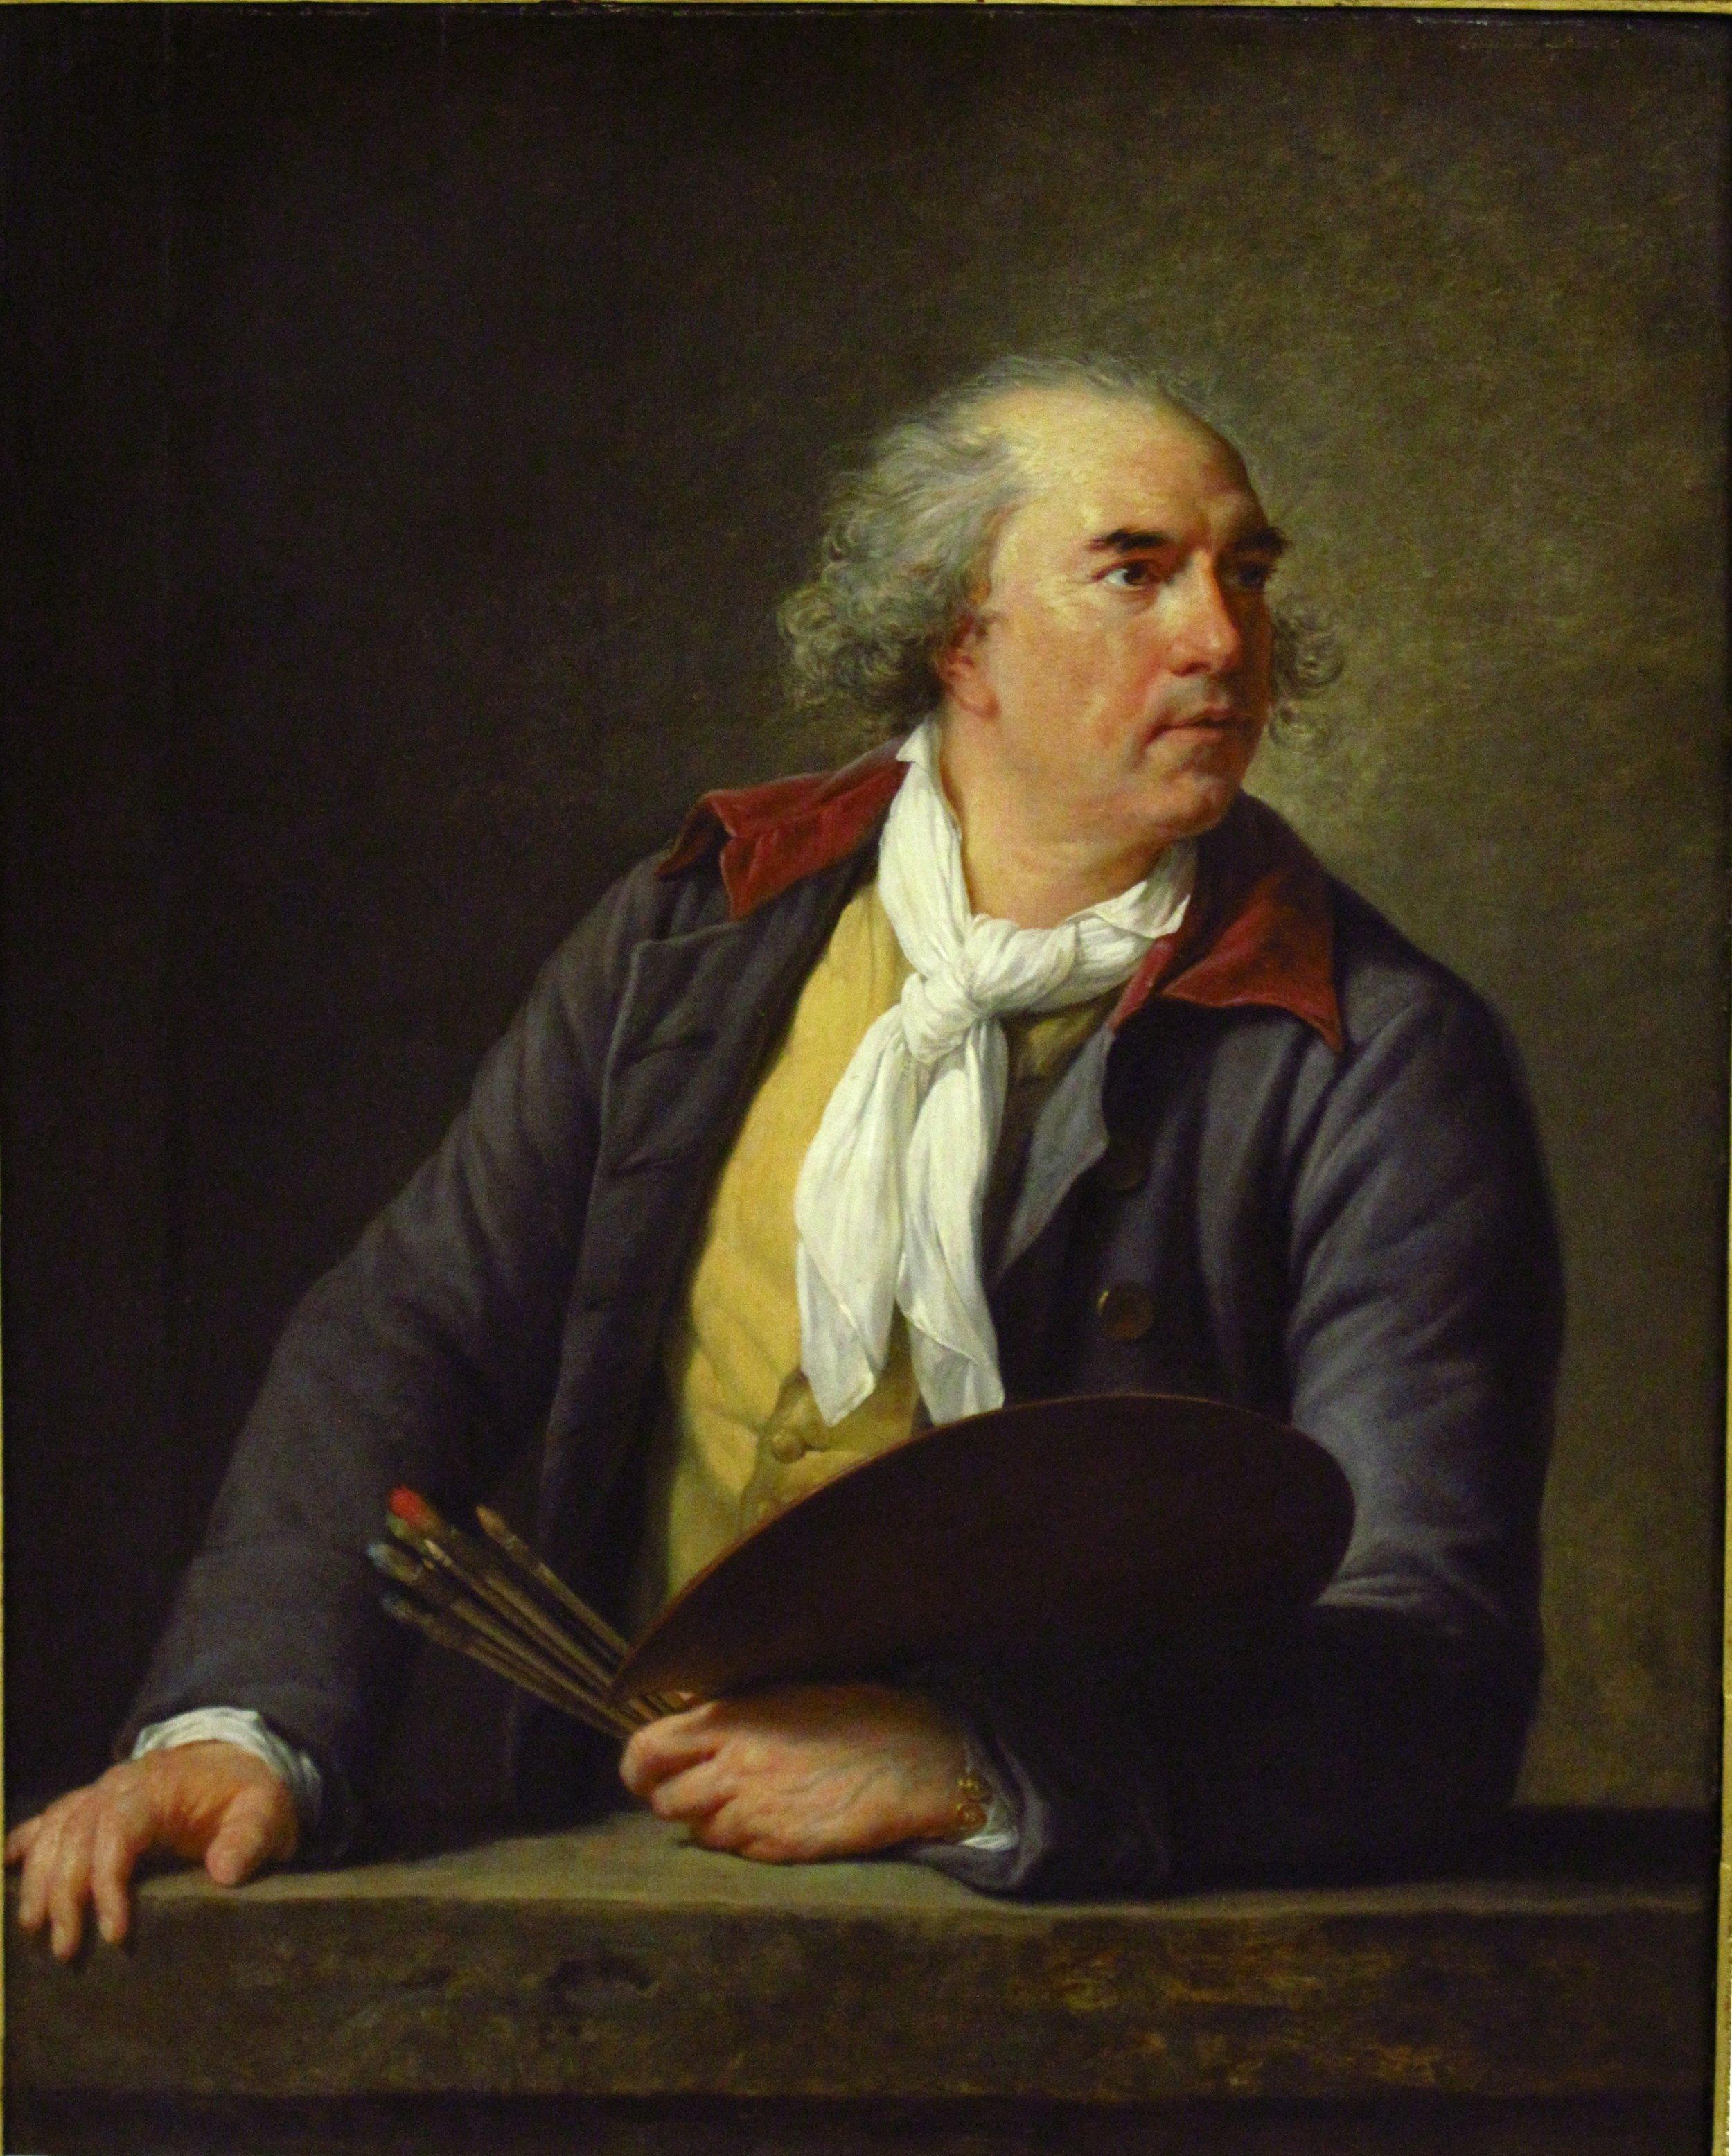 Elisabeth Vigée Lebrun, Hubert Robert, 1788, oil on canvas, Musée du Louvre